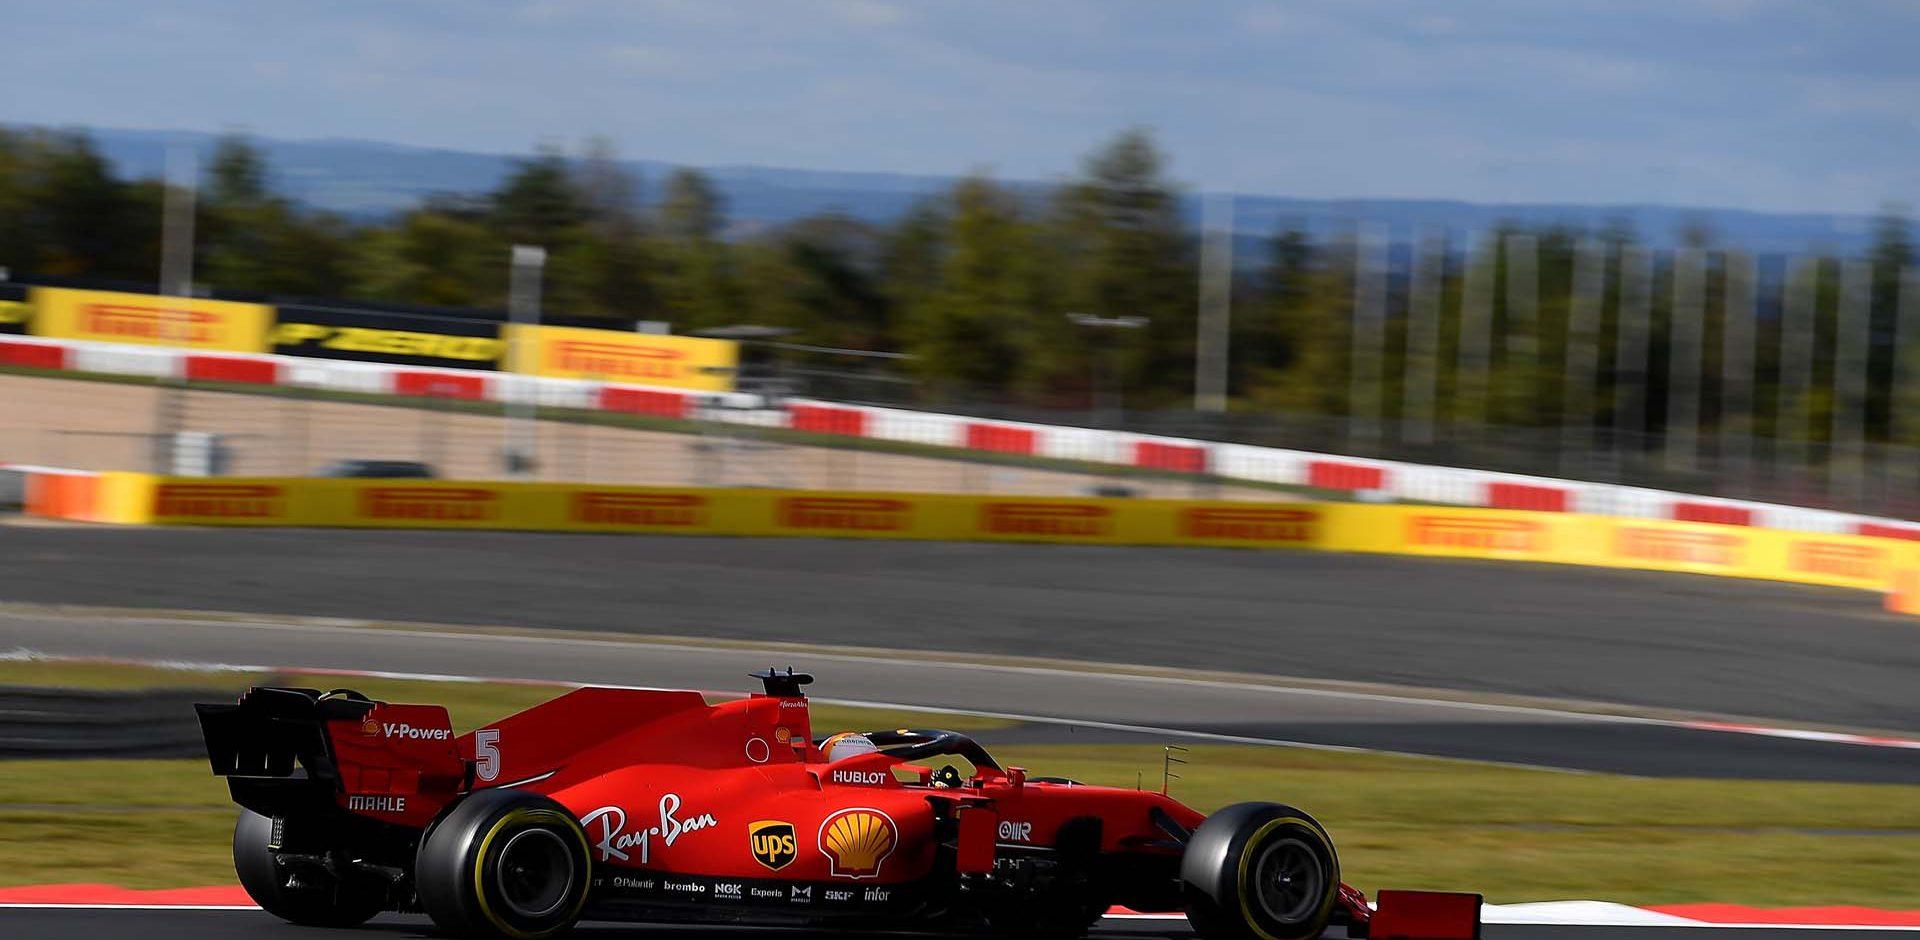 GP GERMANIA F1/2020 -  SABATO  10/10/2020   credit: @Scuderia Ferrari Press Office Sebastian Vettel